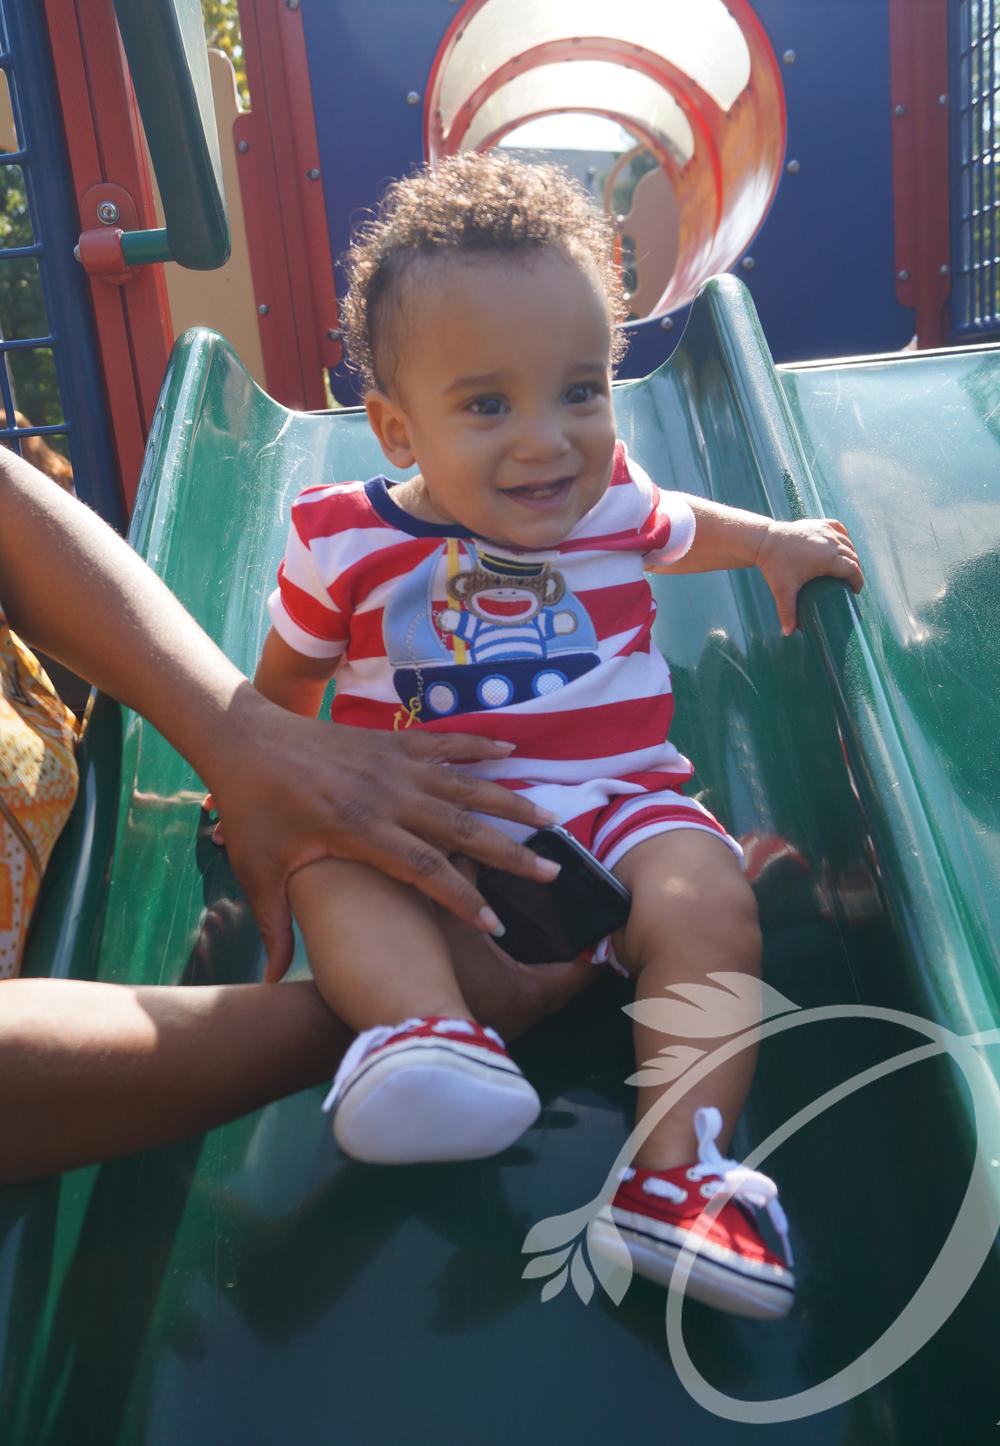 Josiah on slide.jpg